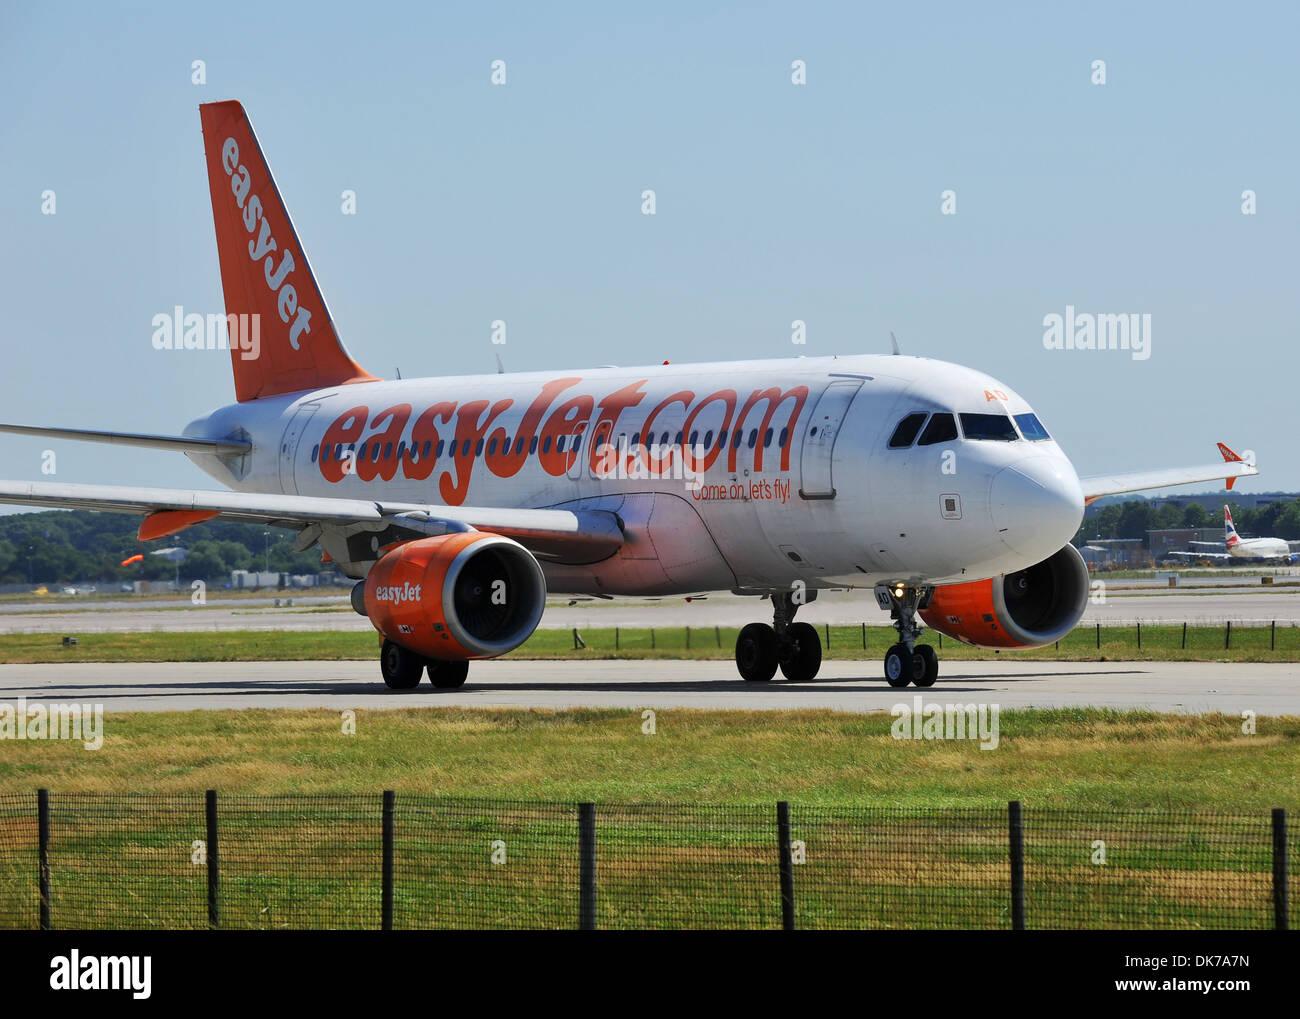 EasyJet plane, EasyJet airline, EasyJet aeroplane at Gatwick Airport, London, Britain, UK - Stock Image